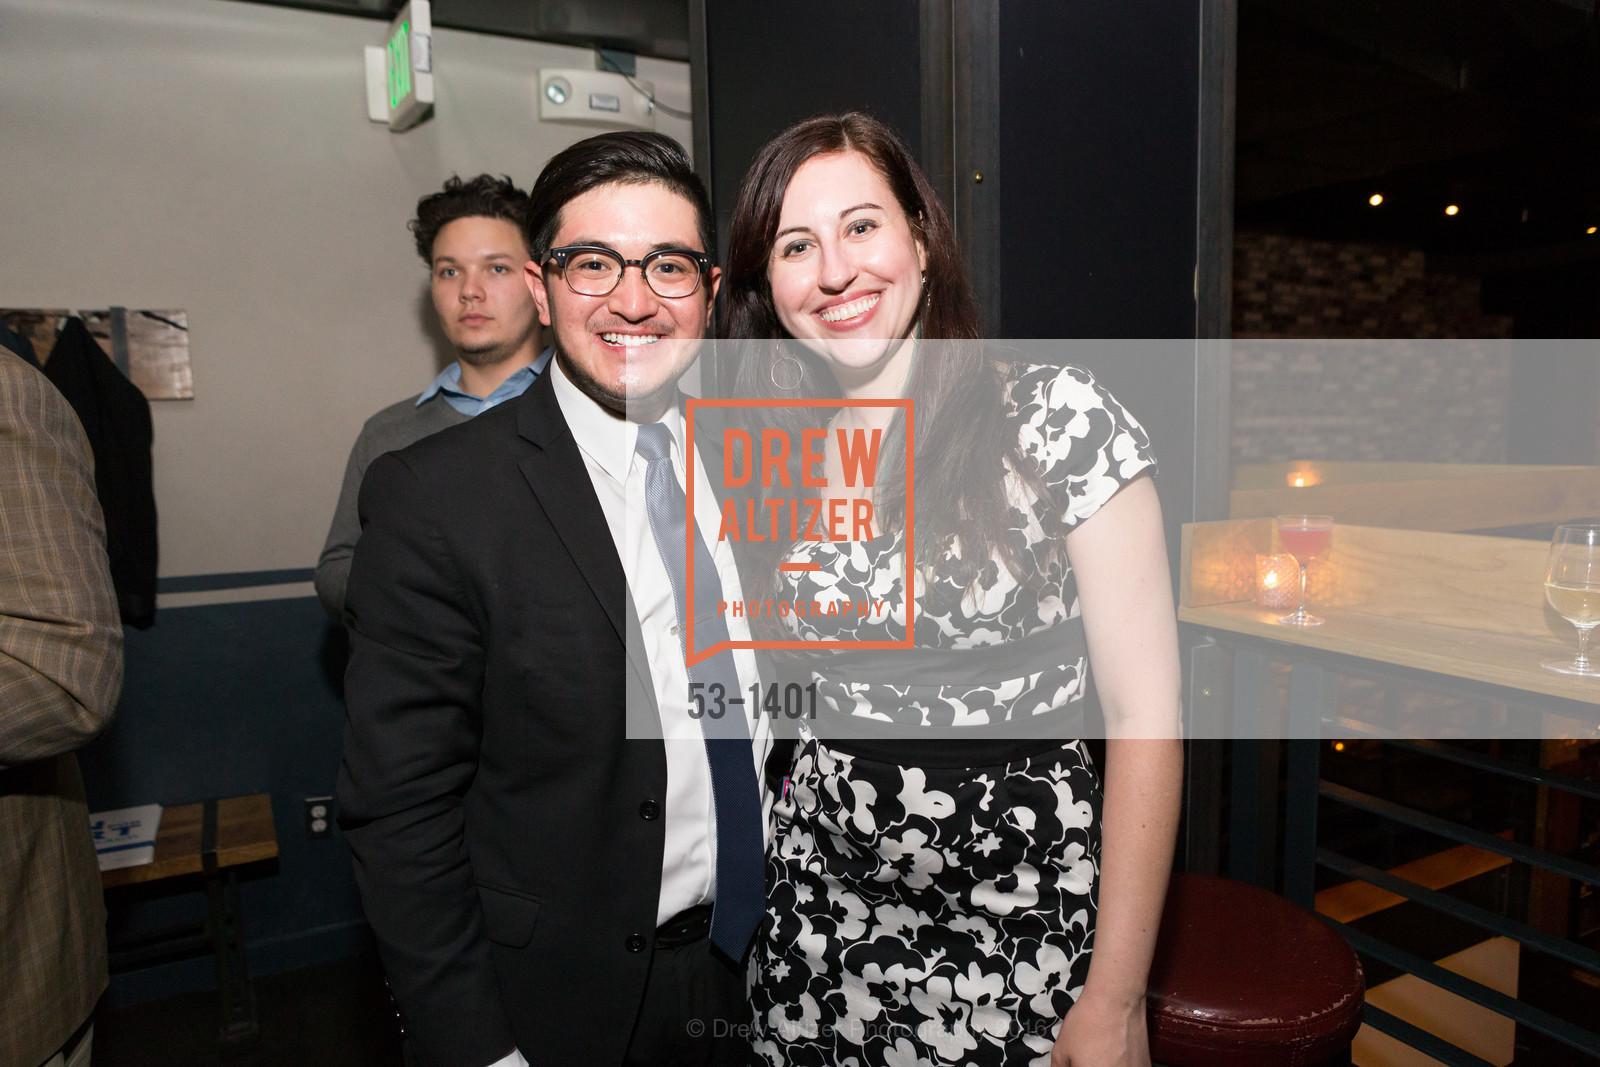 Jason Galisatus, Nicole Yelich, Photo #53-1401